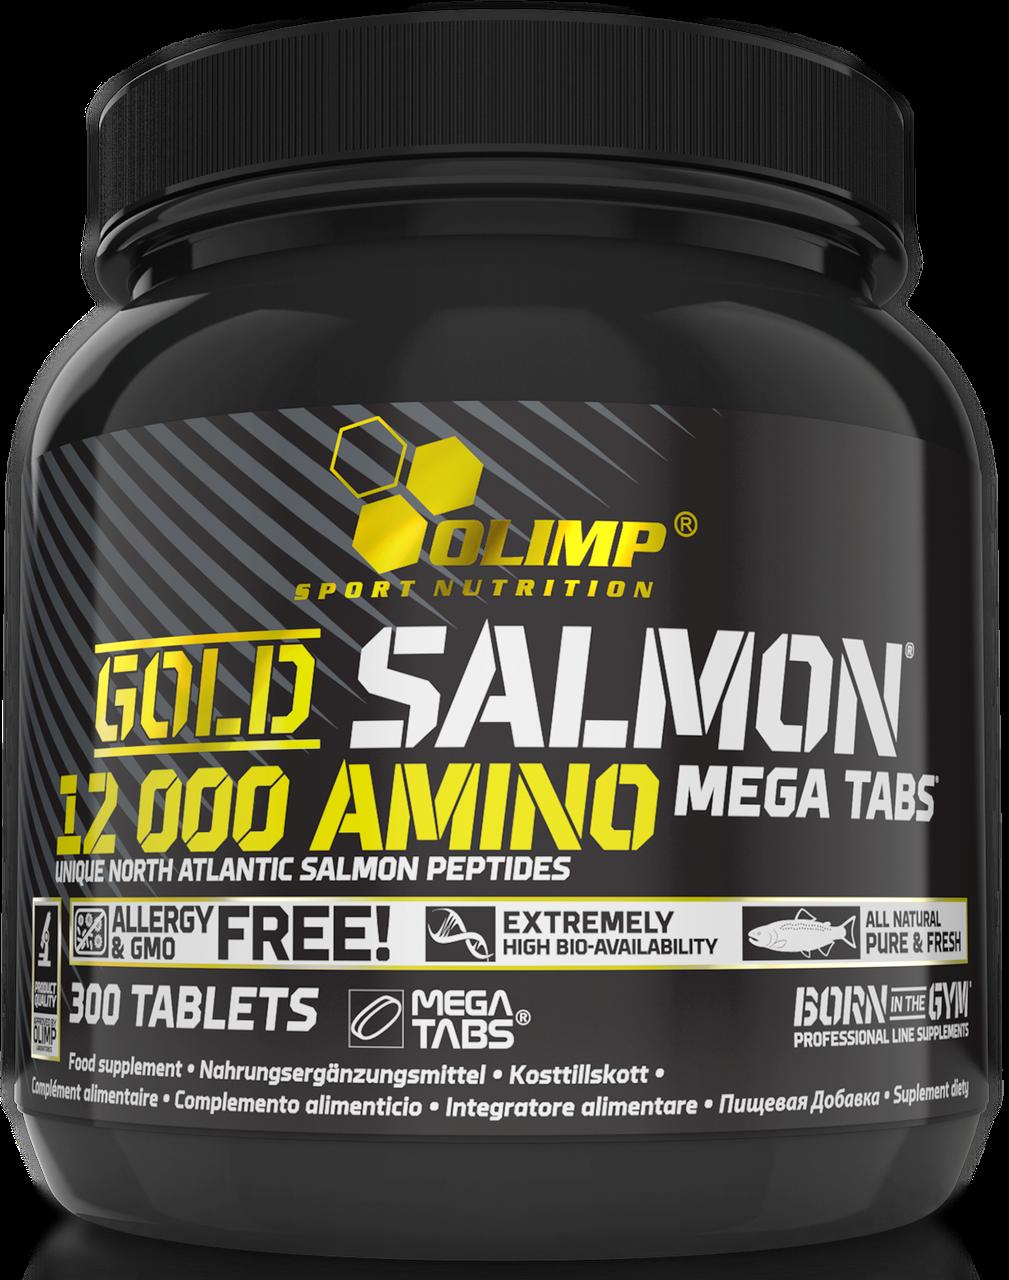 Аминокислоты Olimp Gold Salmon 12000 Amino mega 300 tab